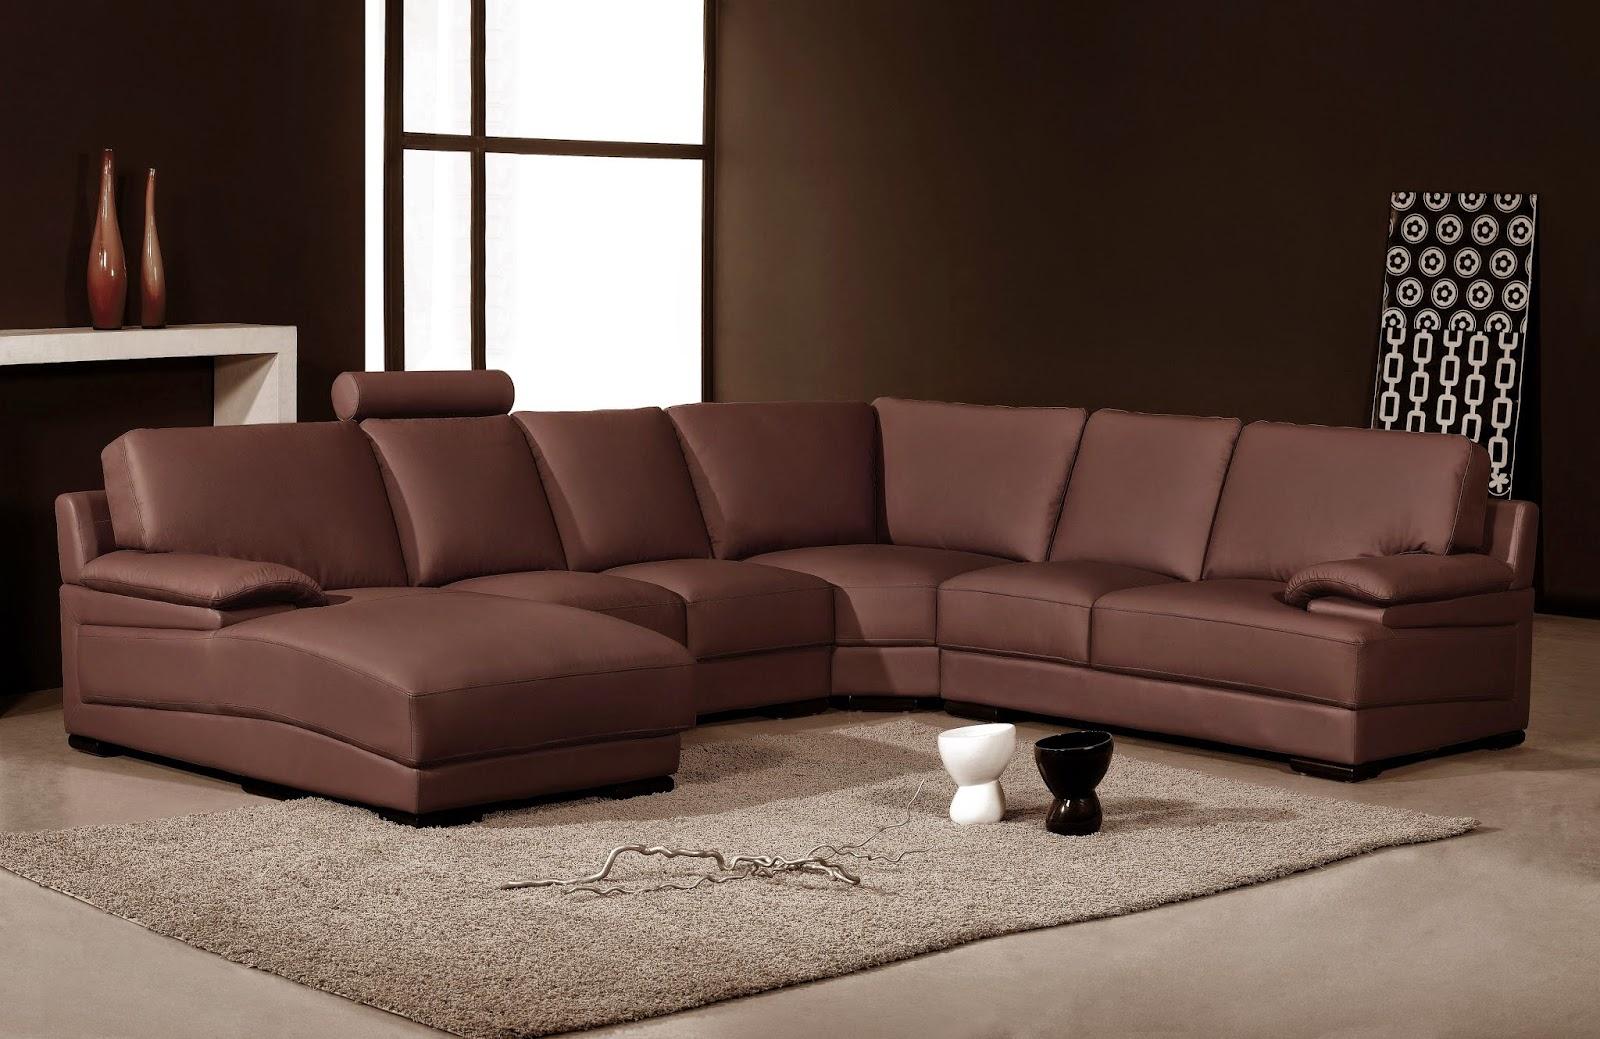 Marvelous 2 Living Room Decor Ideas Brown Leather Sofa Home Design Ncnpc Chair Design For Home Ncnpcorg